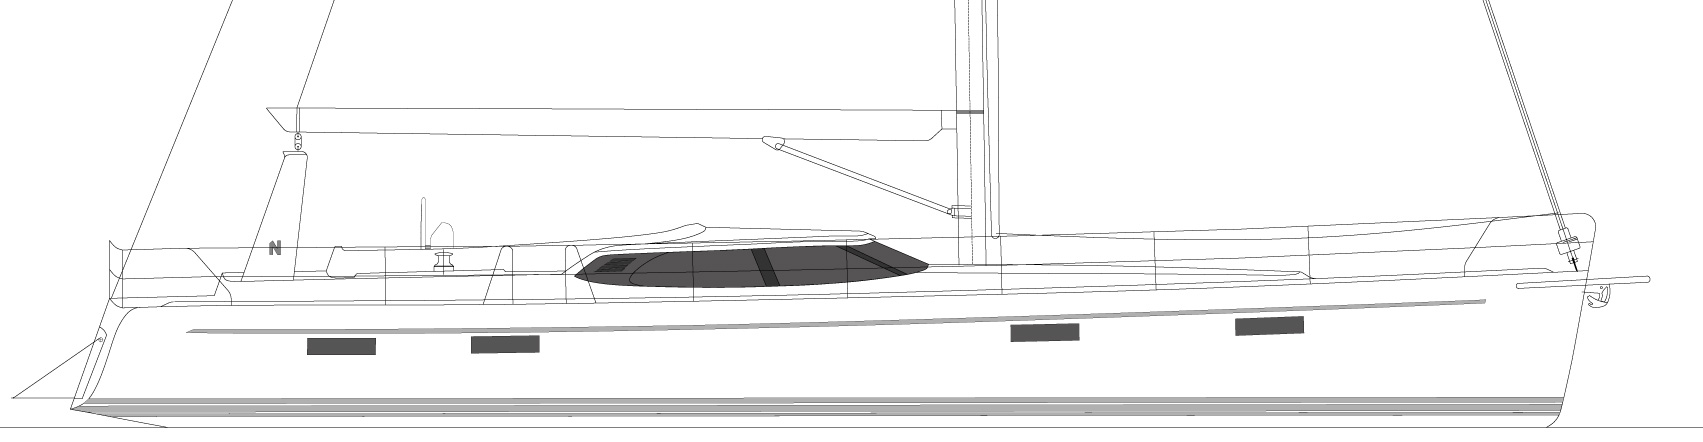 Nordship 56 deck saloon custom design